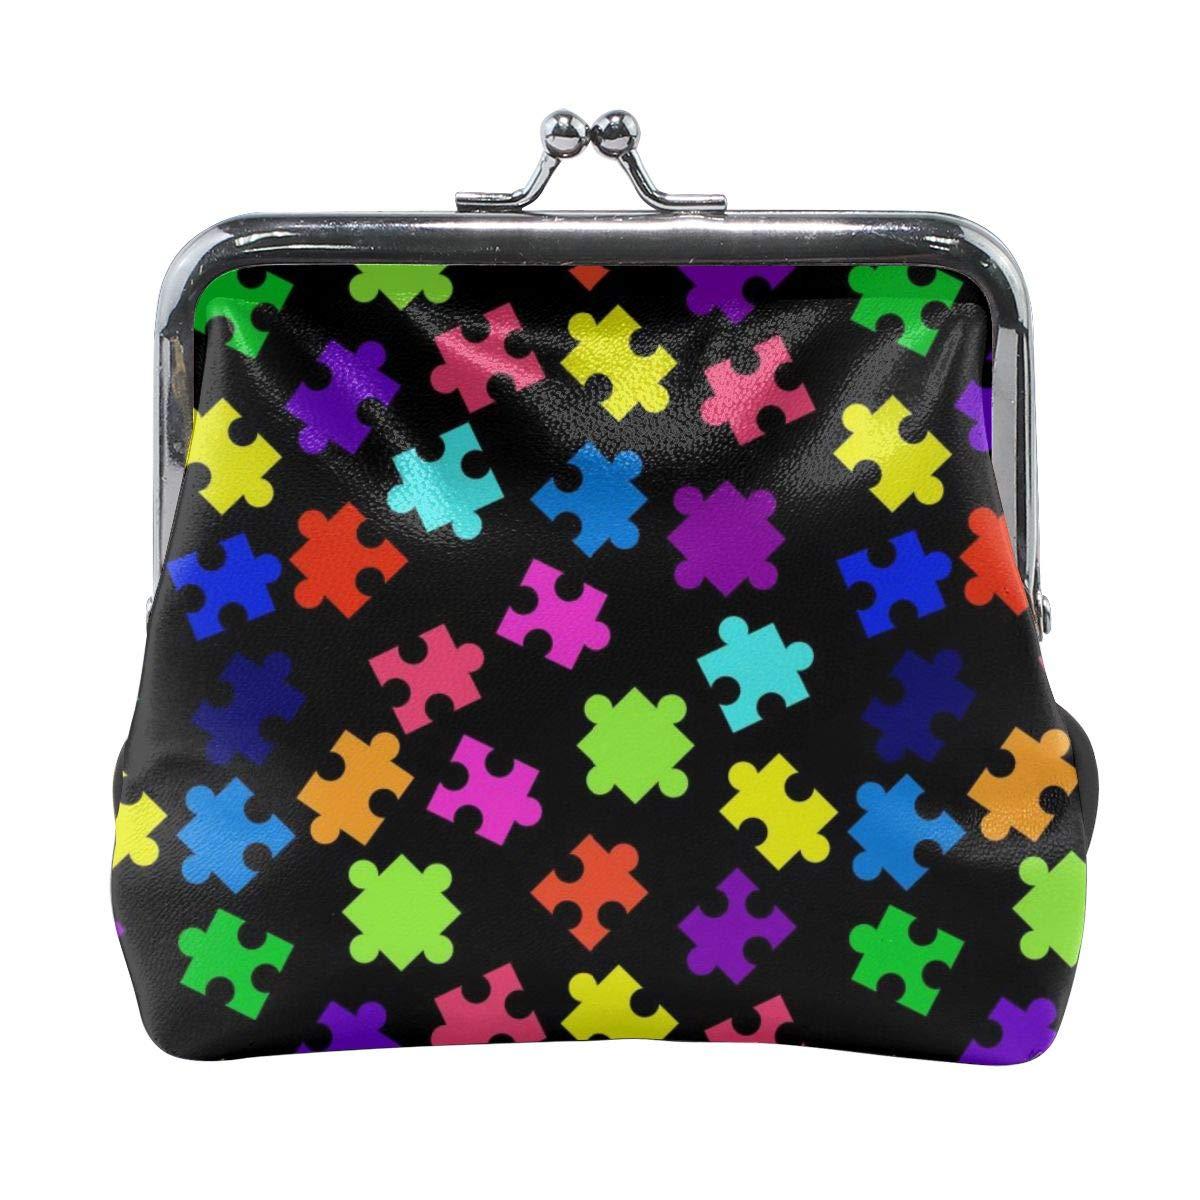 Colorful Puzzle Pieces Cute Buckle Coin Purses Buckle Buckle Change Purse Wallets